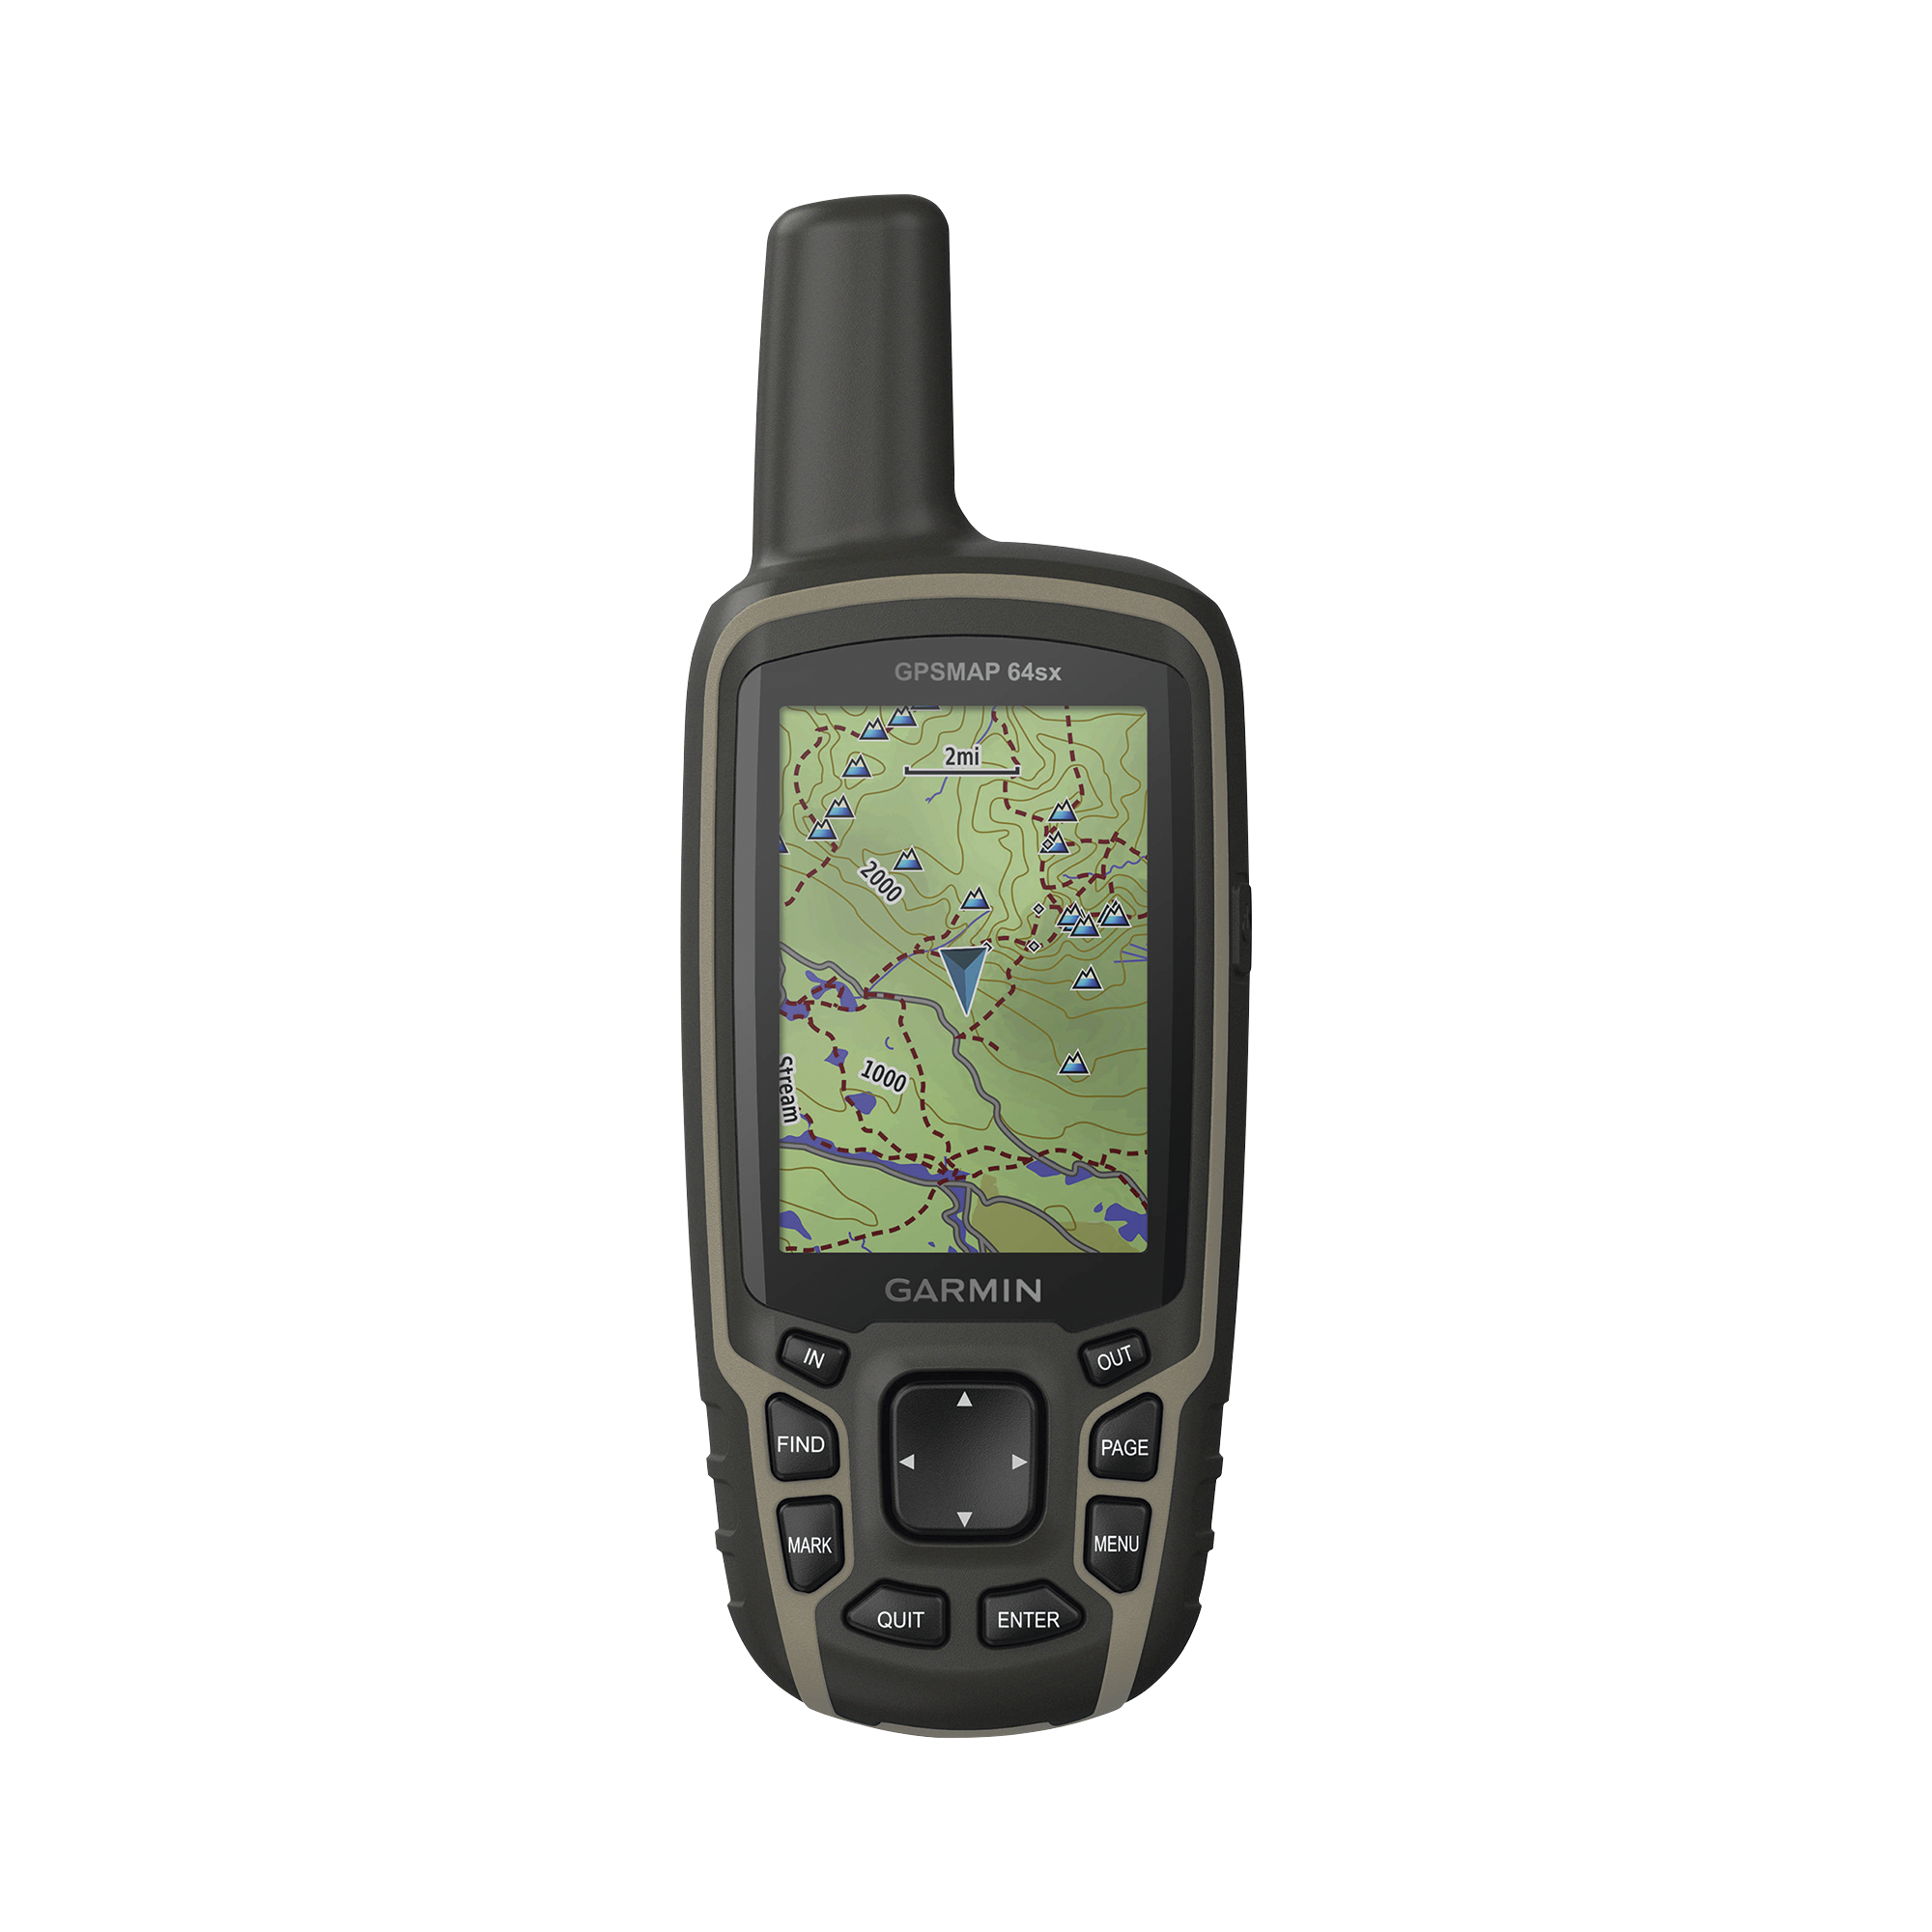 GPSMAP 64SX, GPS portátil con sensores de navegación, altímetro, brújula, calculo de áreas.